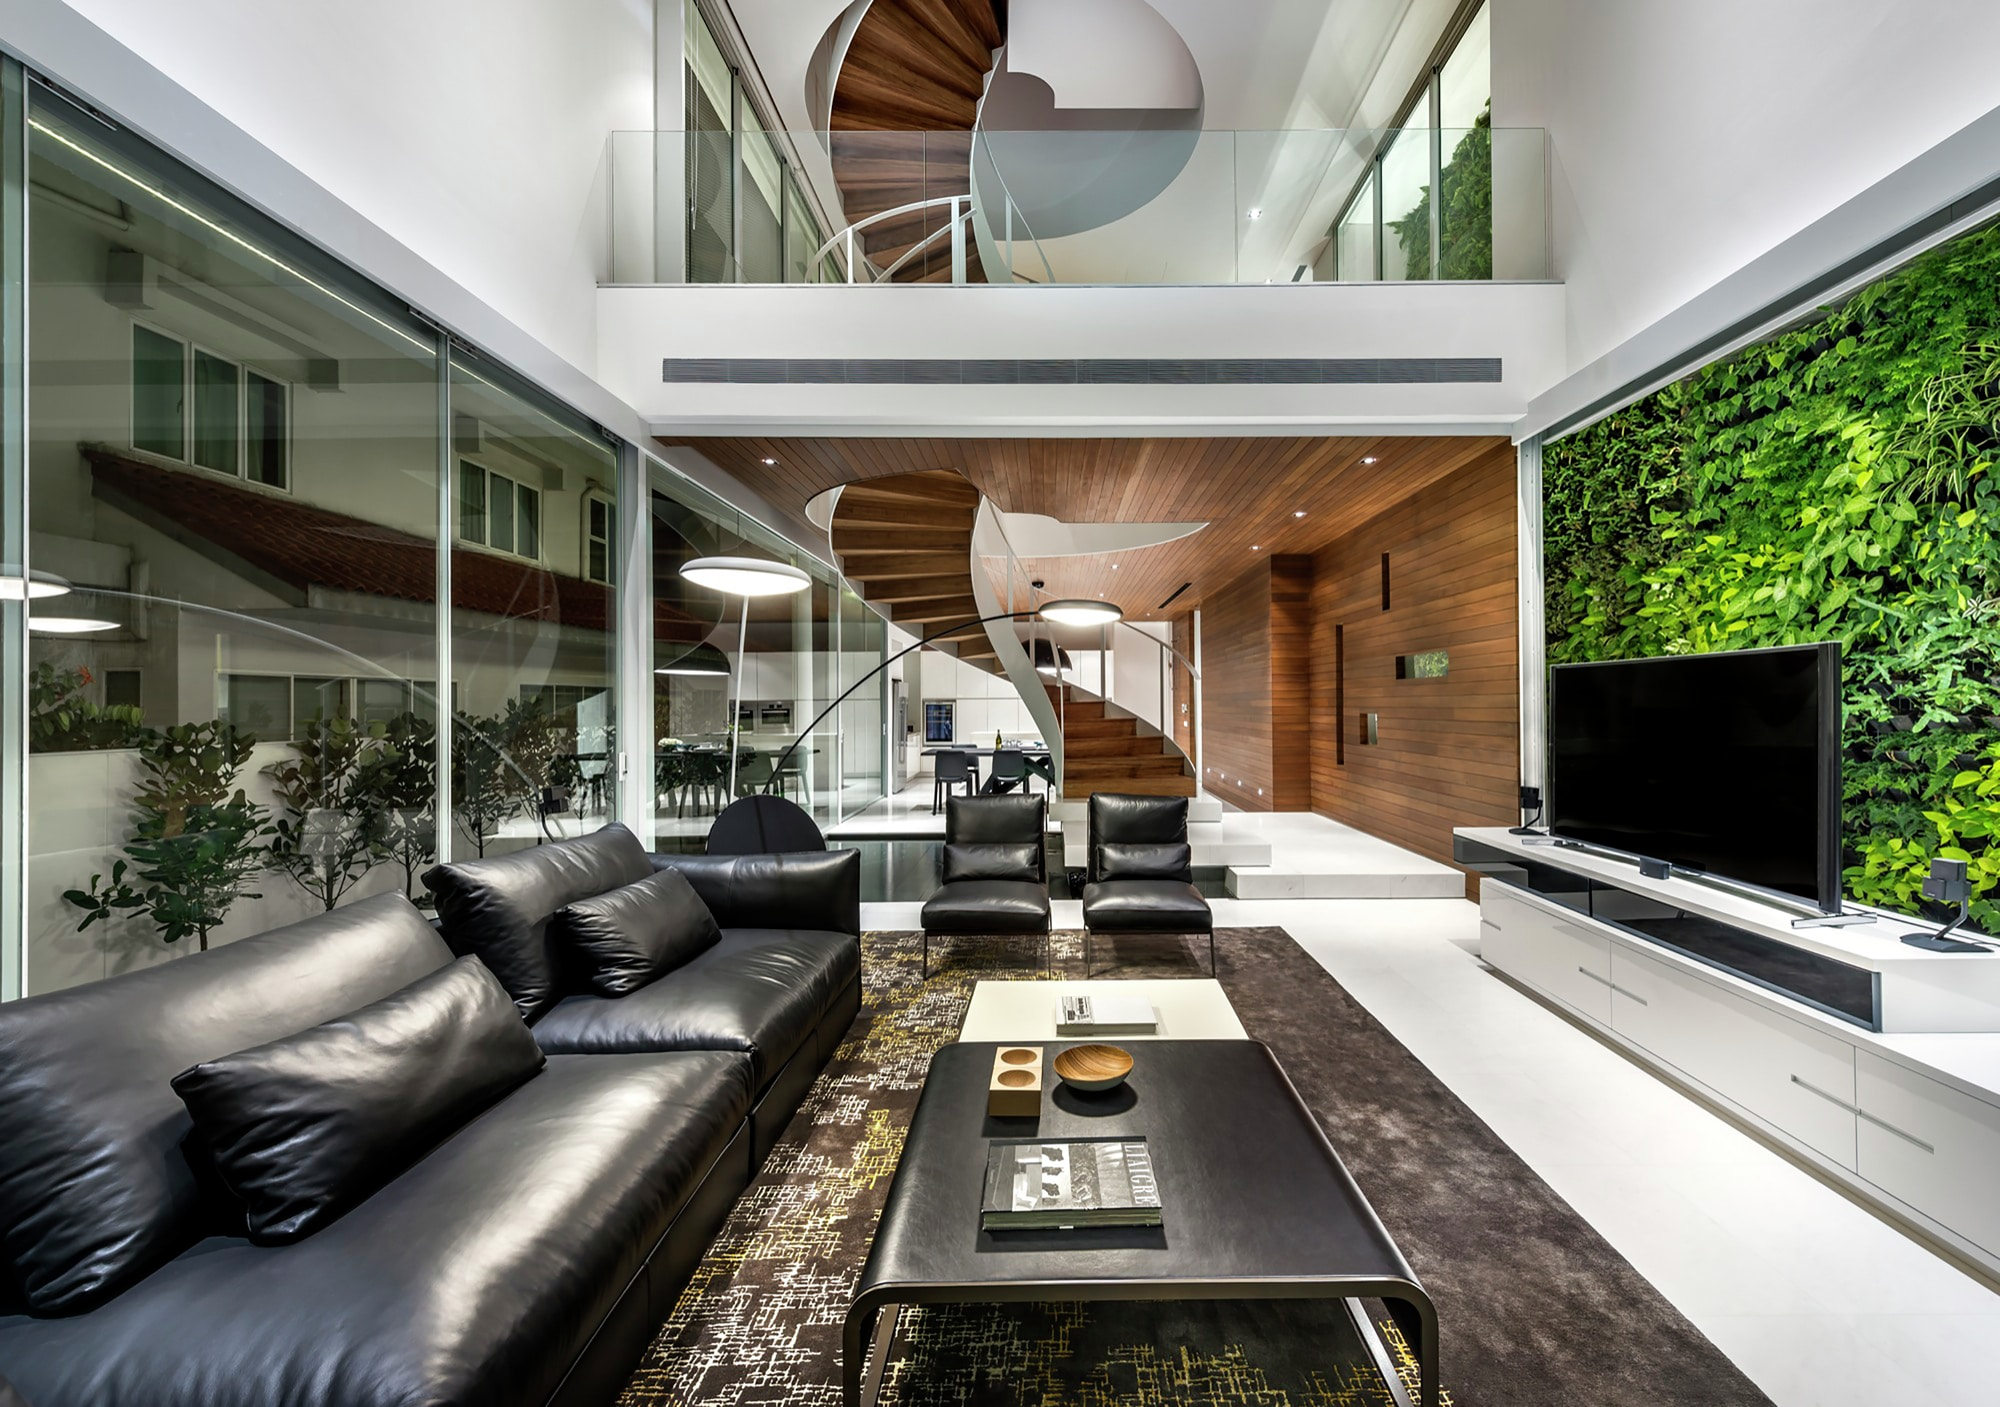 Casa moderna cuatro dormitorios construye hogar for New house design 2016